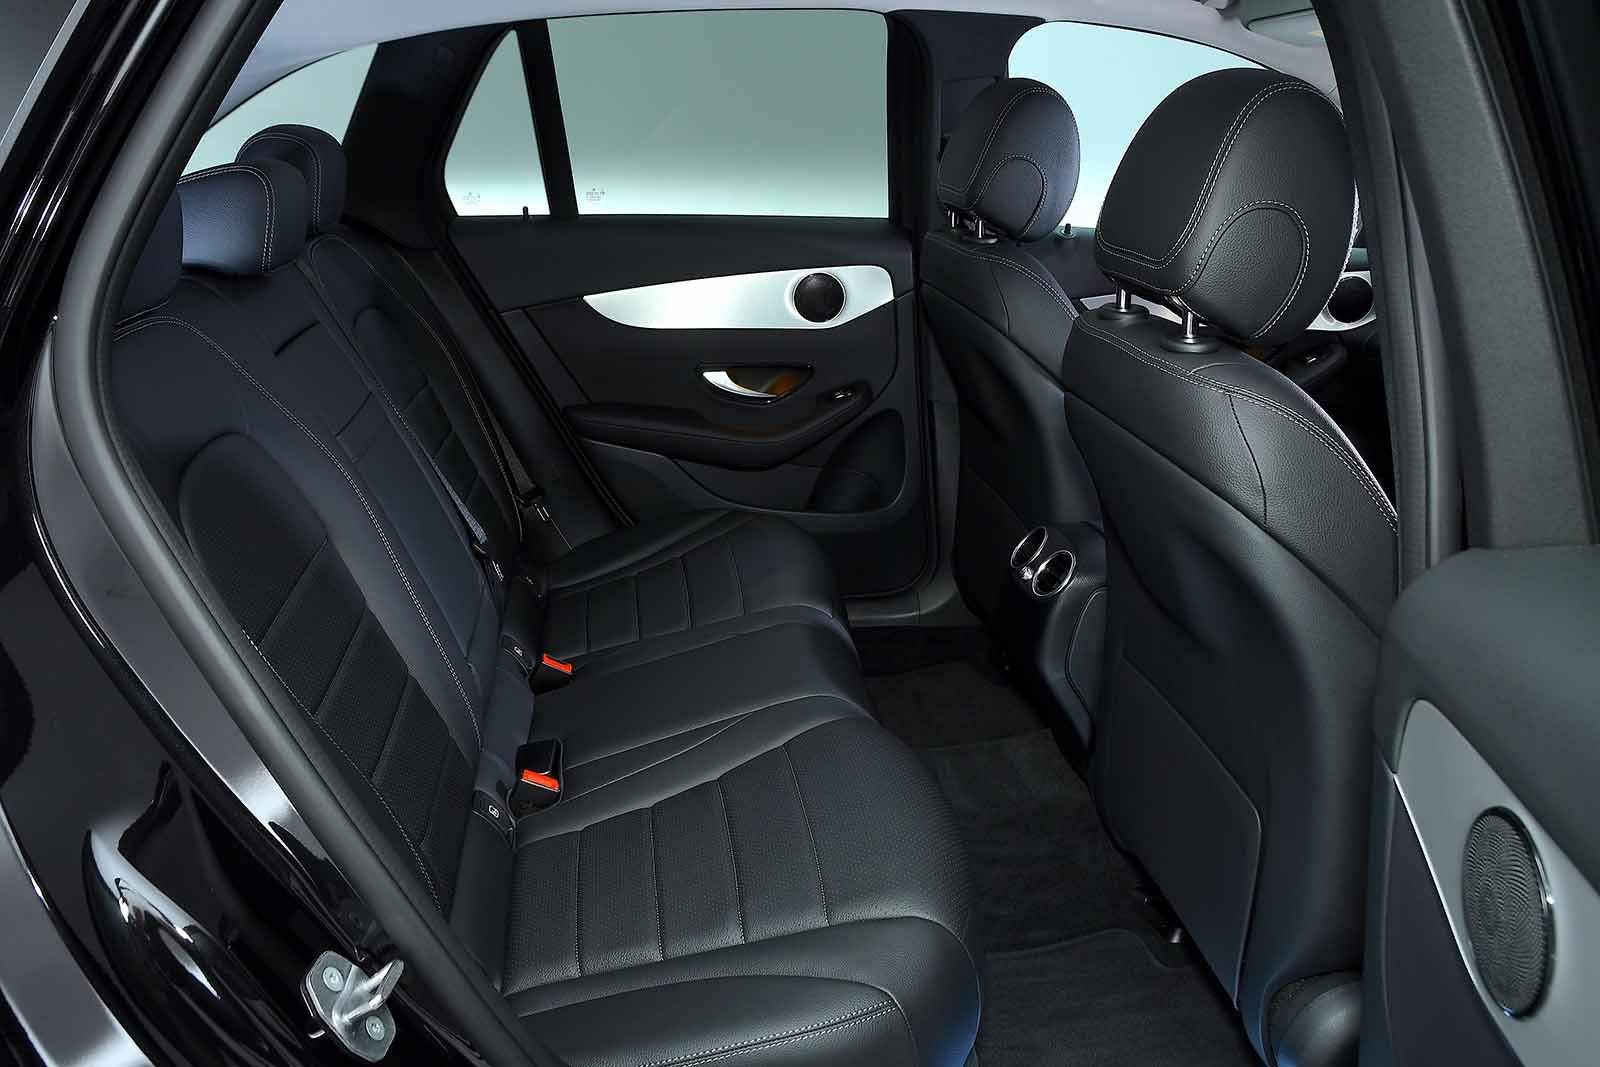 Mercedes-Benz GLC 2019 rear seats